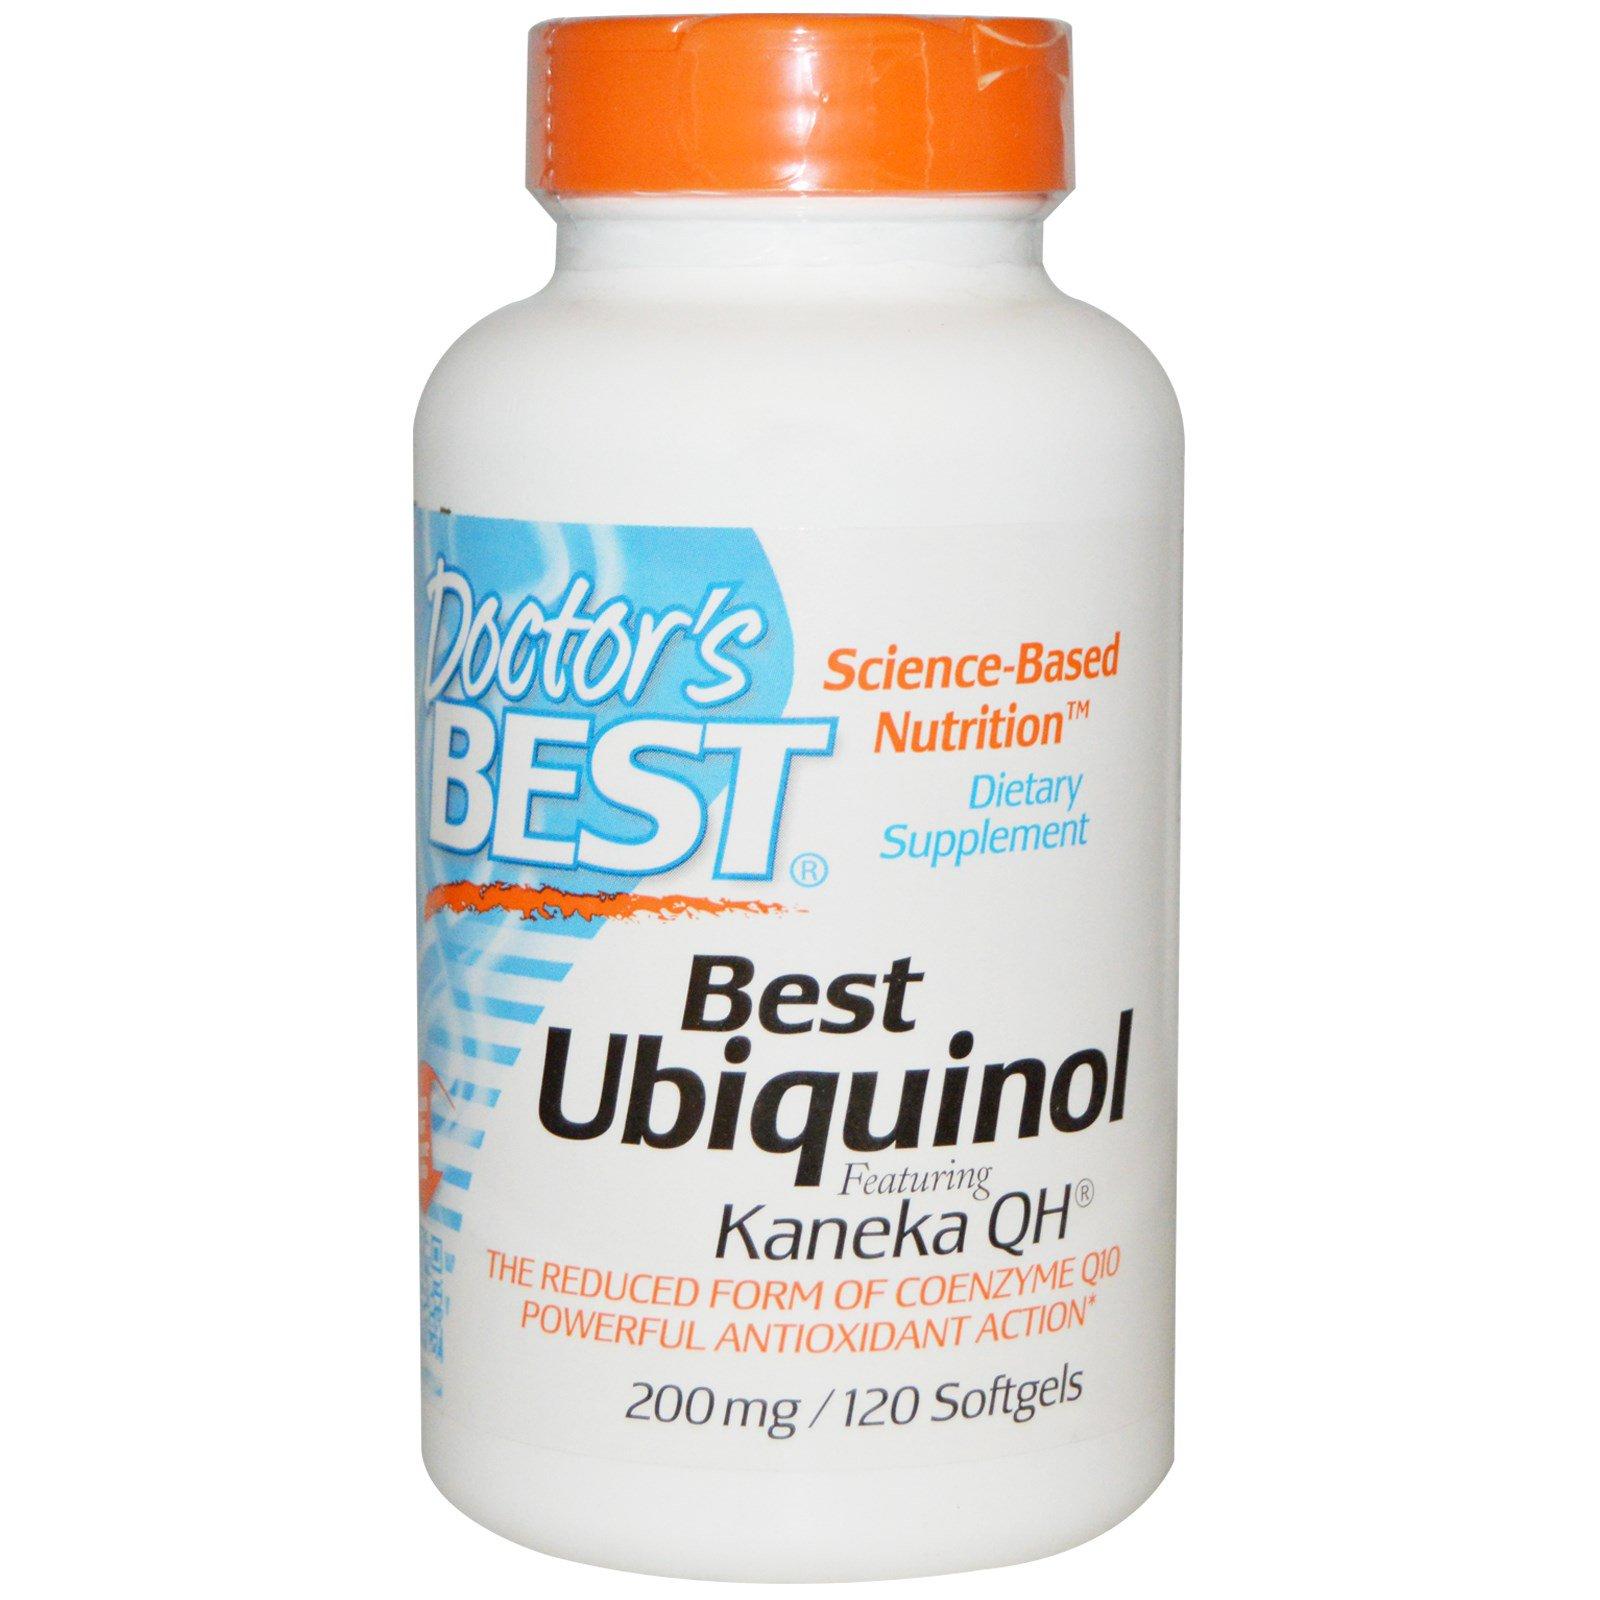 Doctor's Best, Best, Убихинол с Kaneka QH, 200 мг, 120 капсул